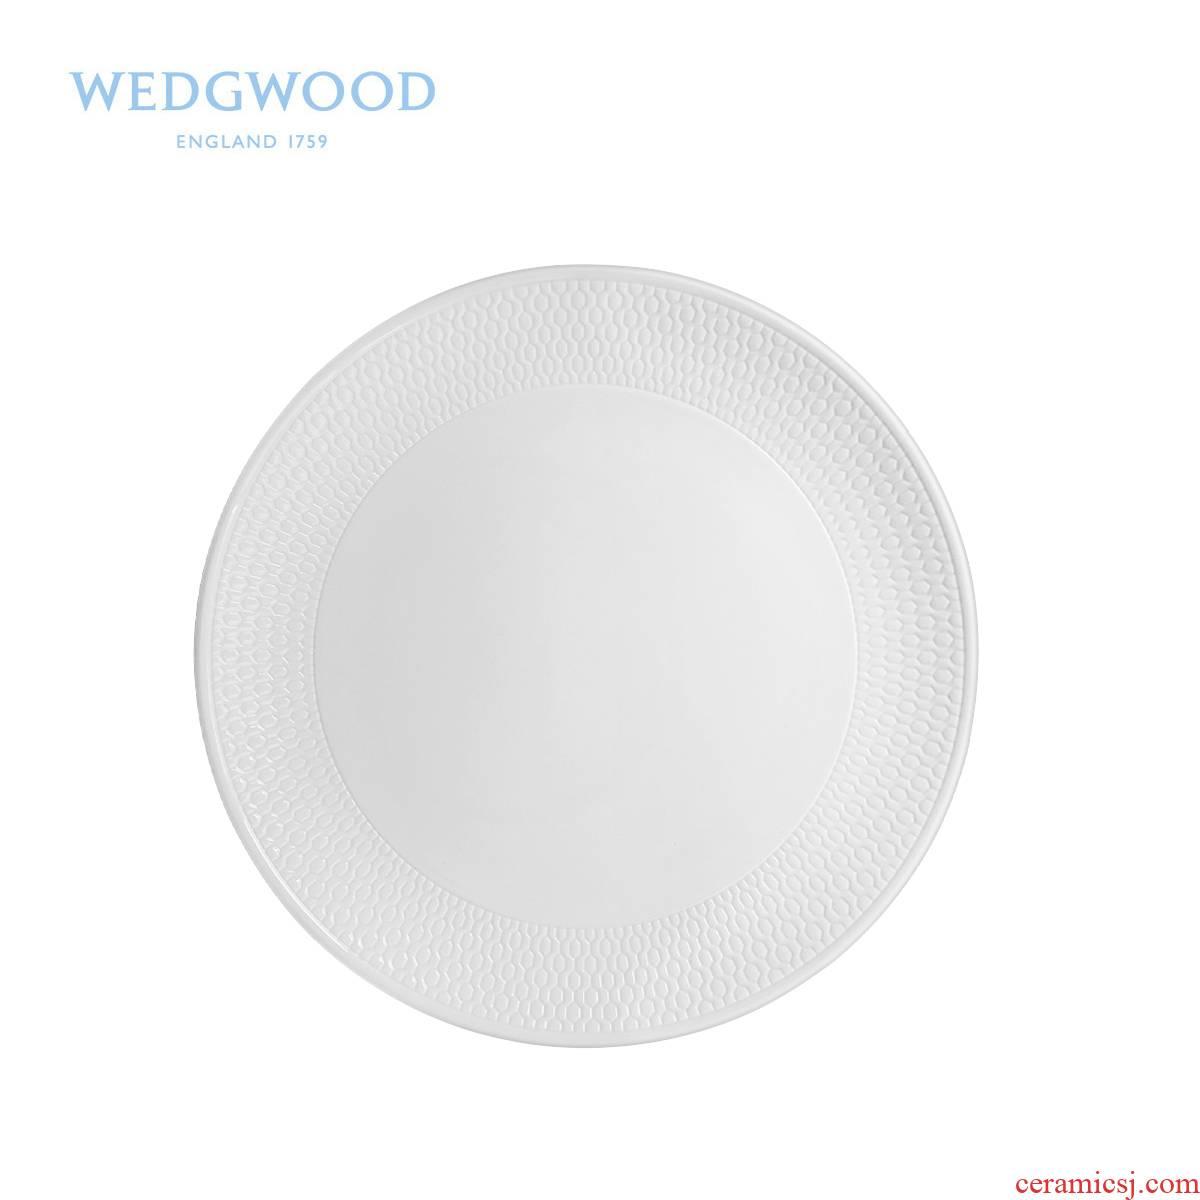 Wedgwood waterford Wedgwood Gio honeycomb series ipads China 20.5 cm flat single pure color cold dish dish